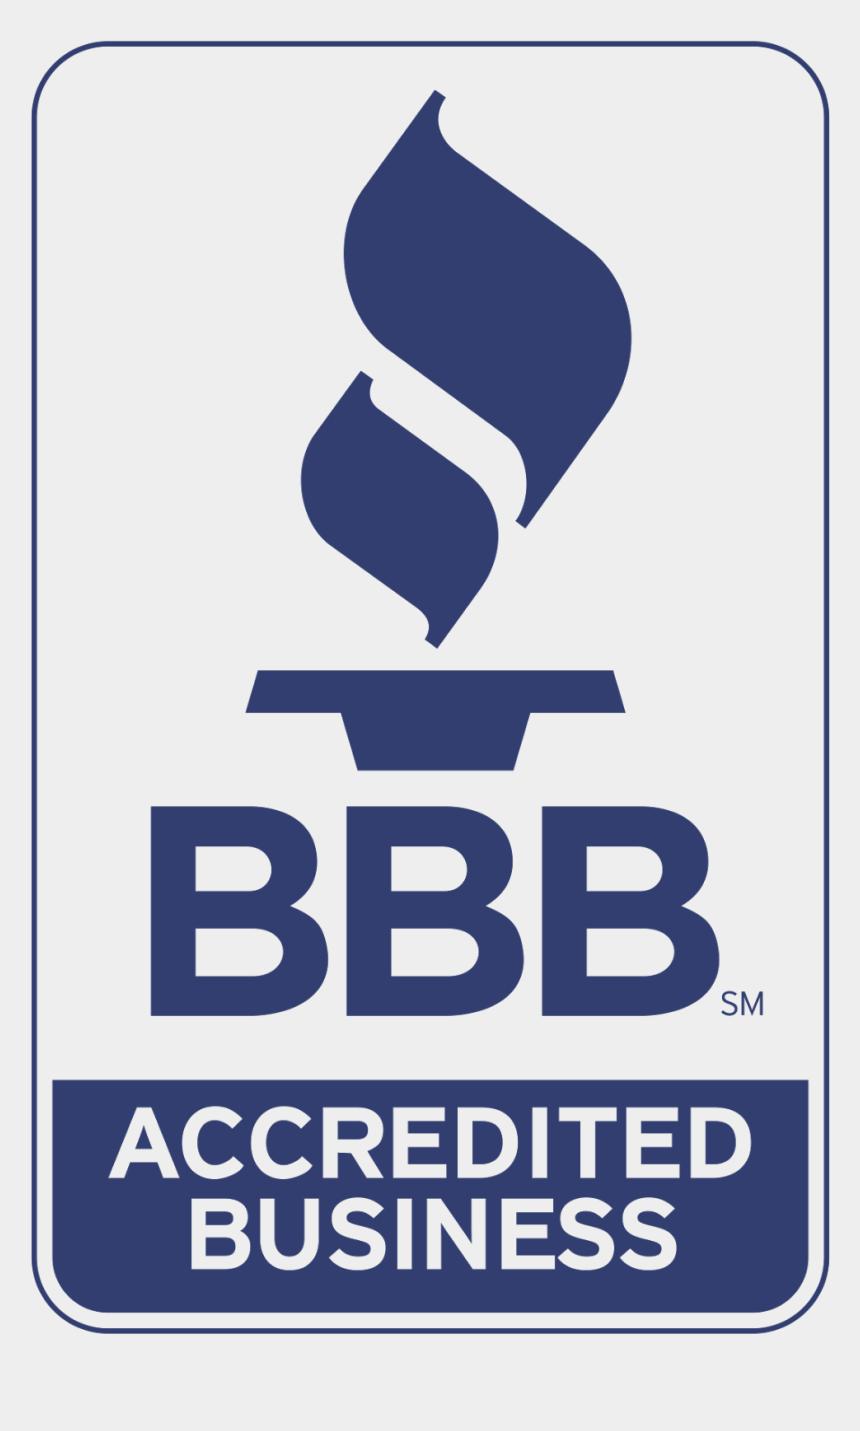 using clipart for business logo, Cartoons - 05 May Better Business Bureau Logo Vector - Better Business Bureau Logo